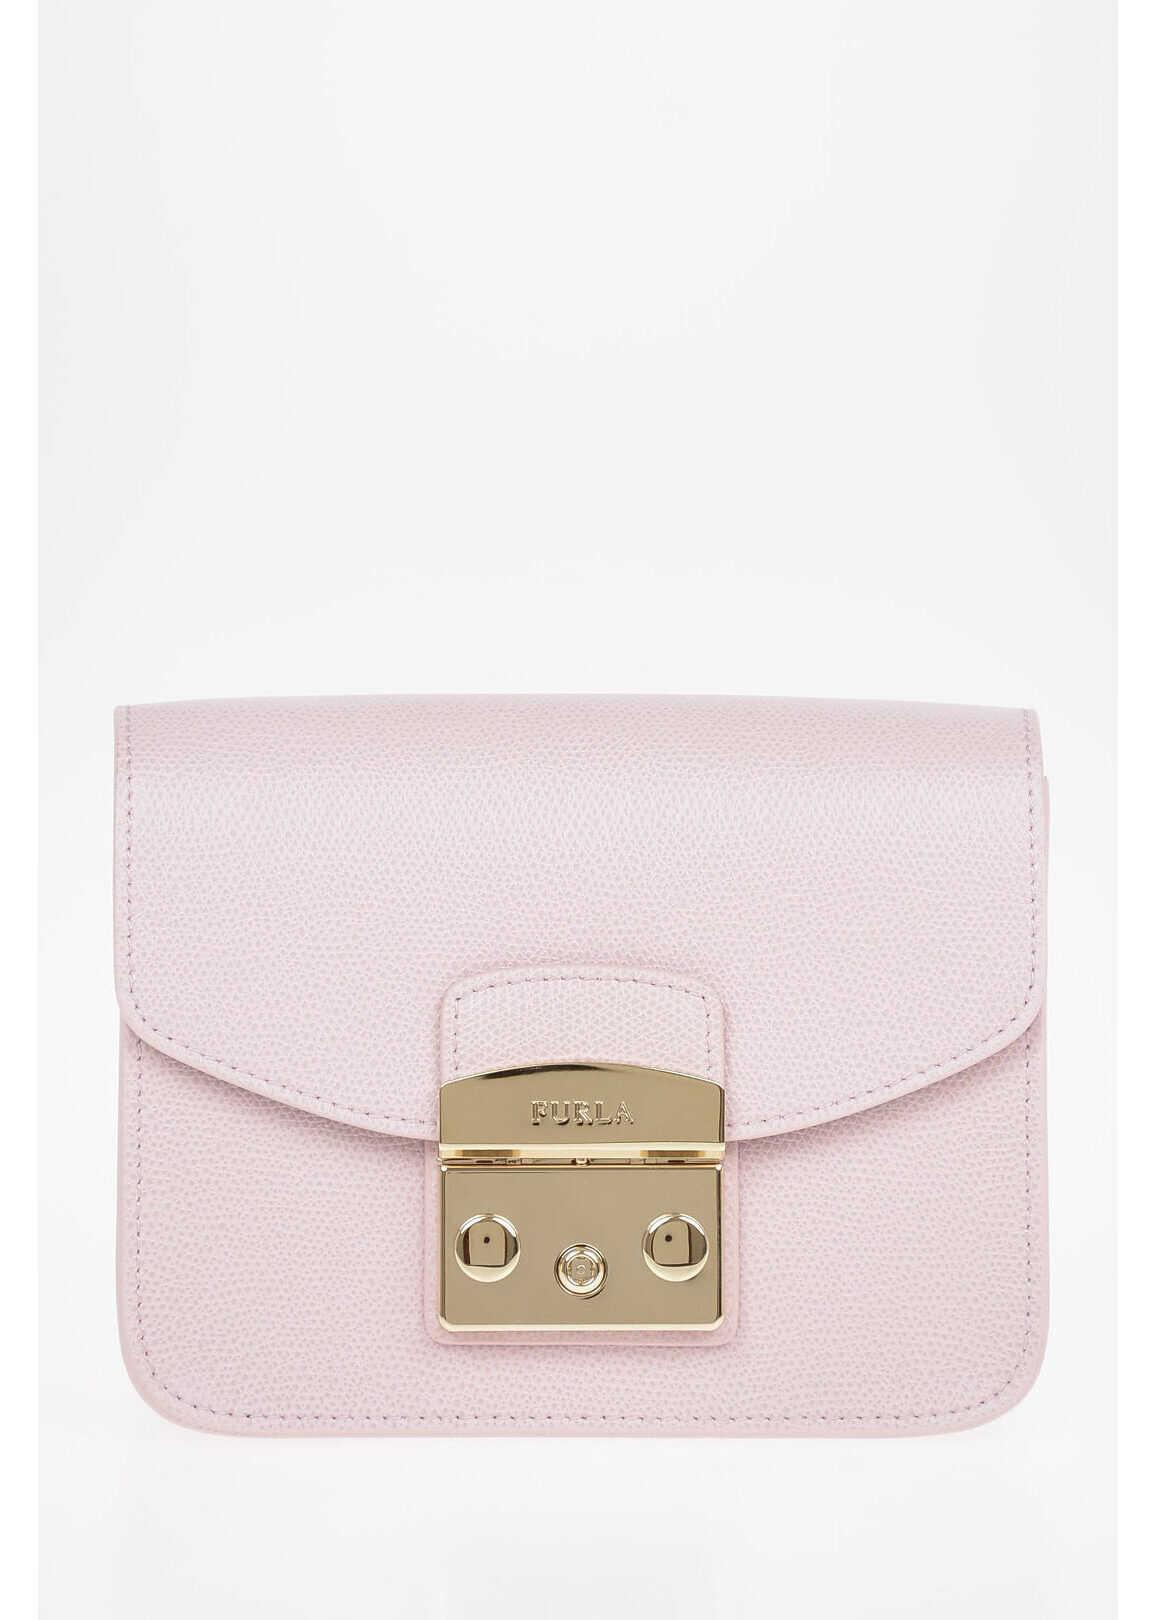 Furla Leather METROPOLIS Mini Bag with Shoulder Chain PINK imagine b-mall.ro